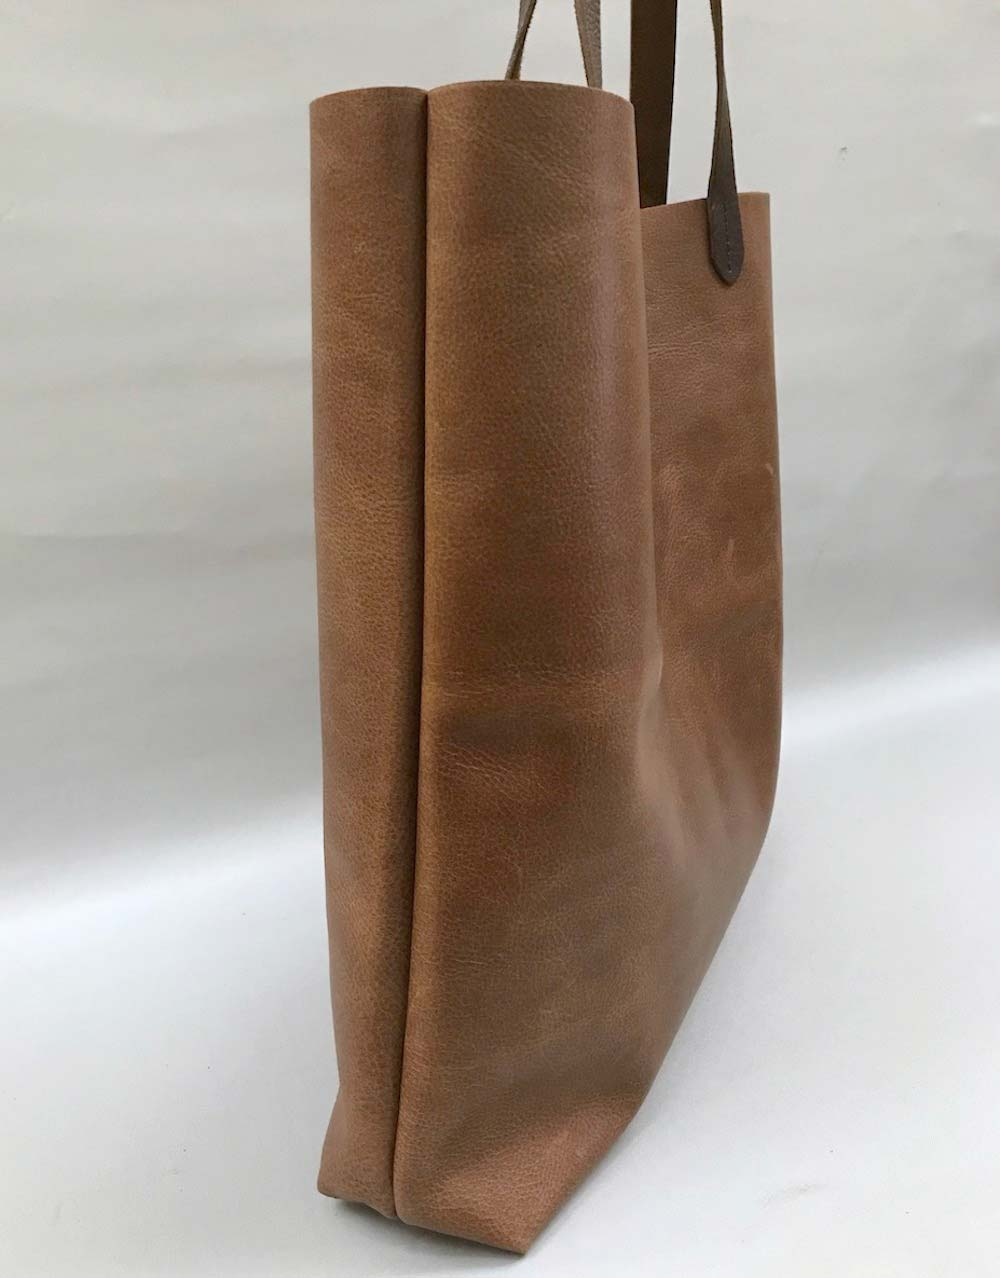 Paula Kirkwood - Tote Bag no 2 1